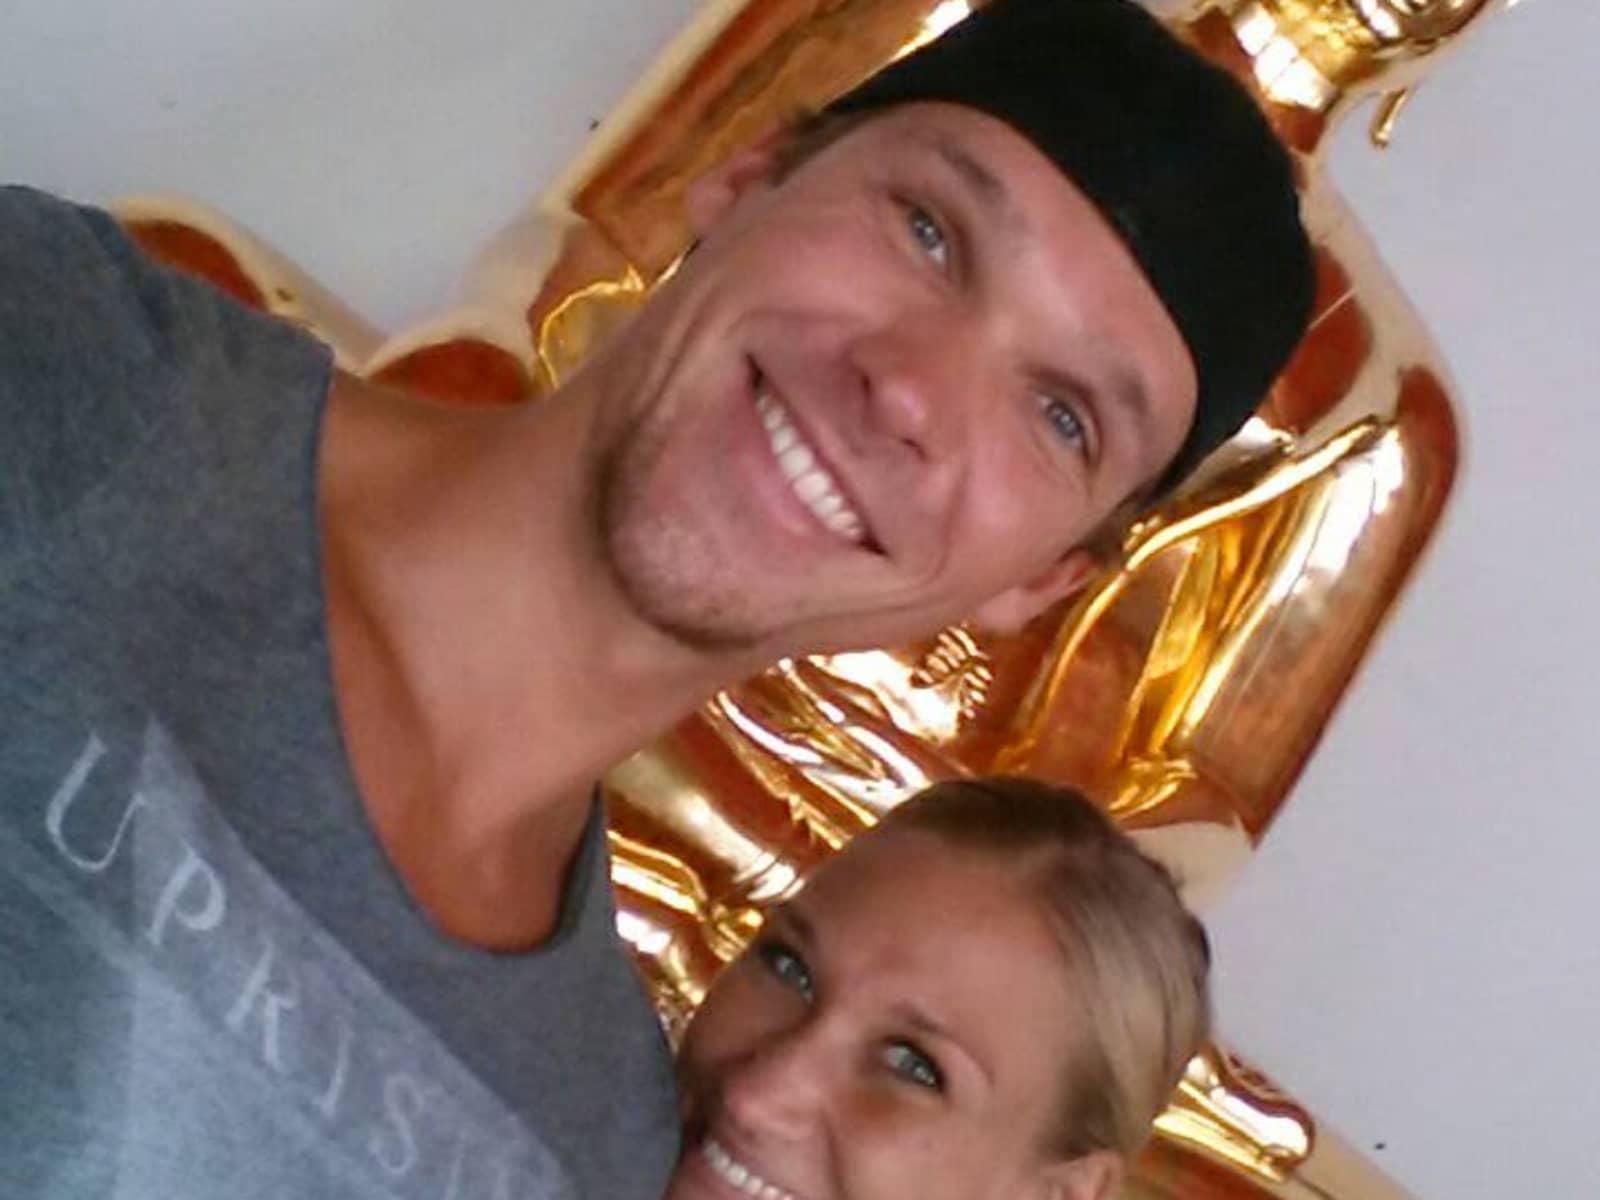 Katja & Andre from Berlin, Germany